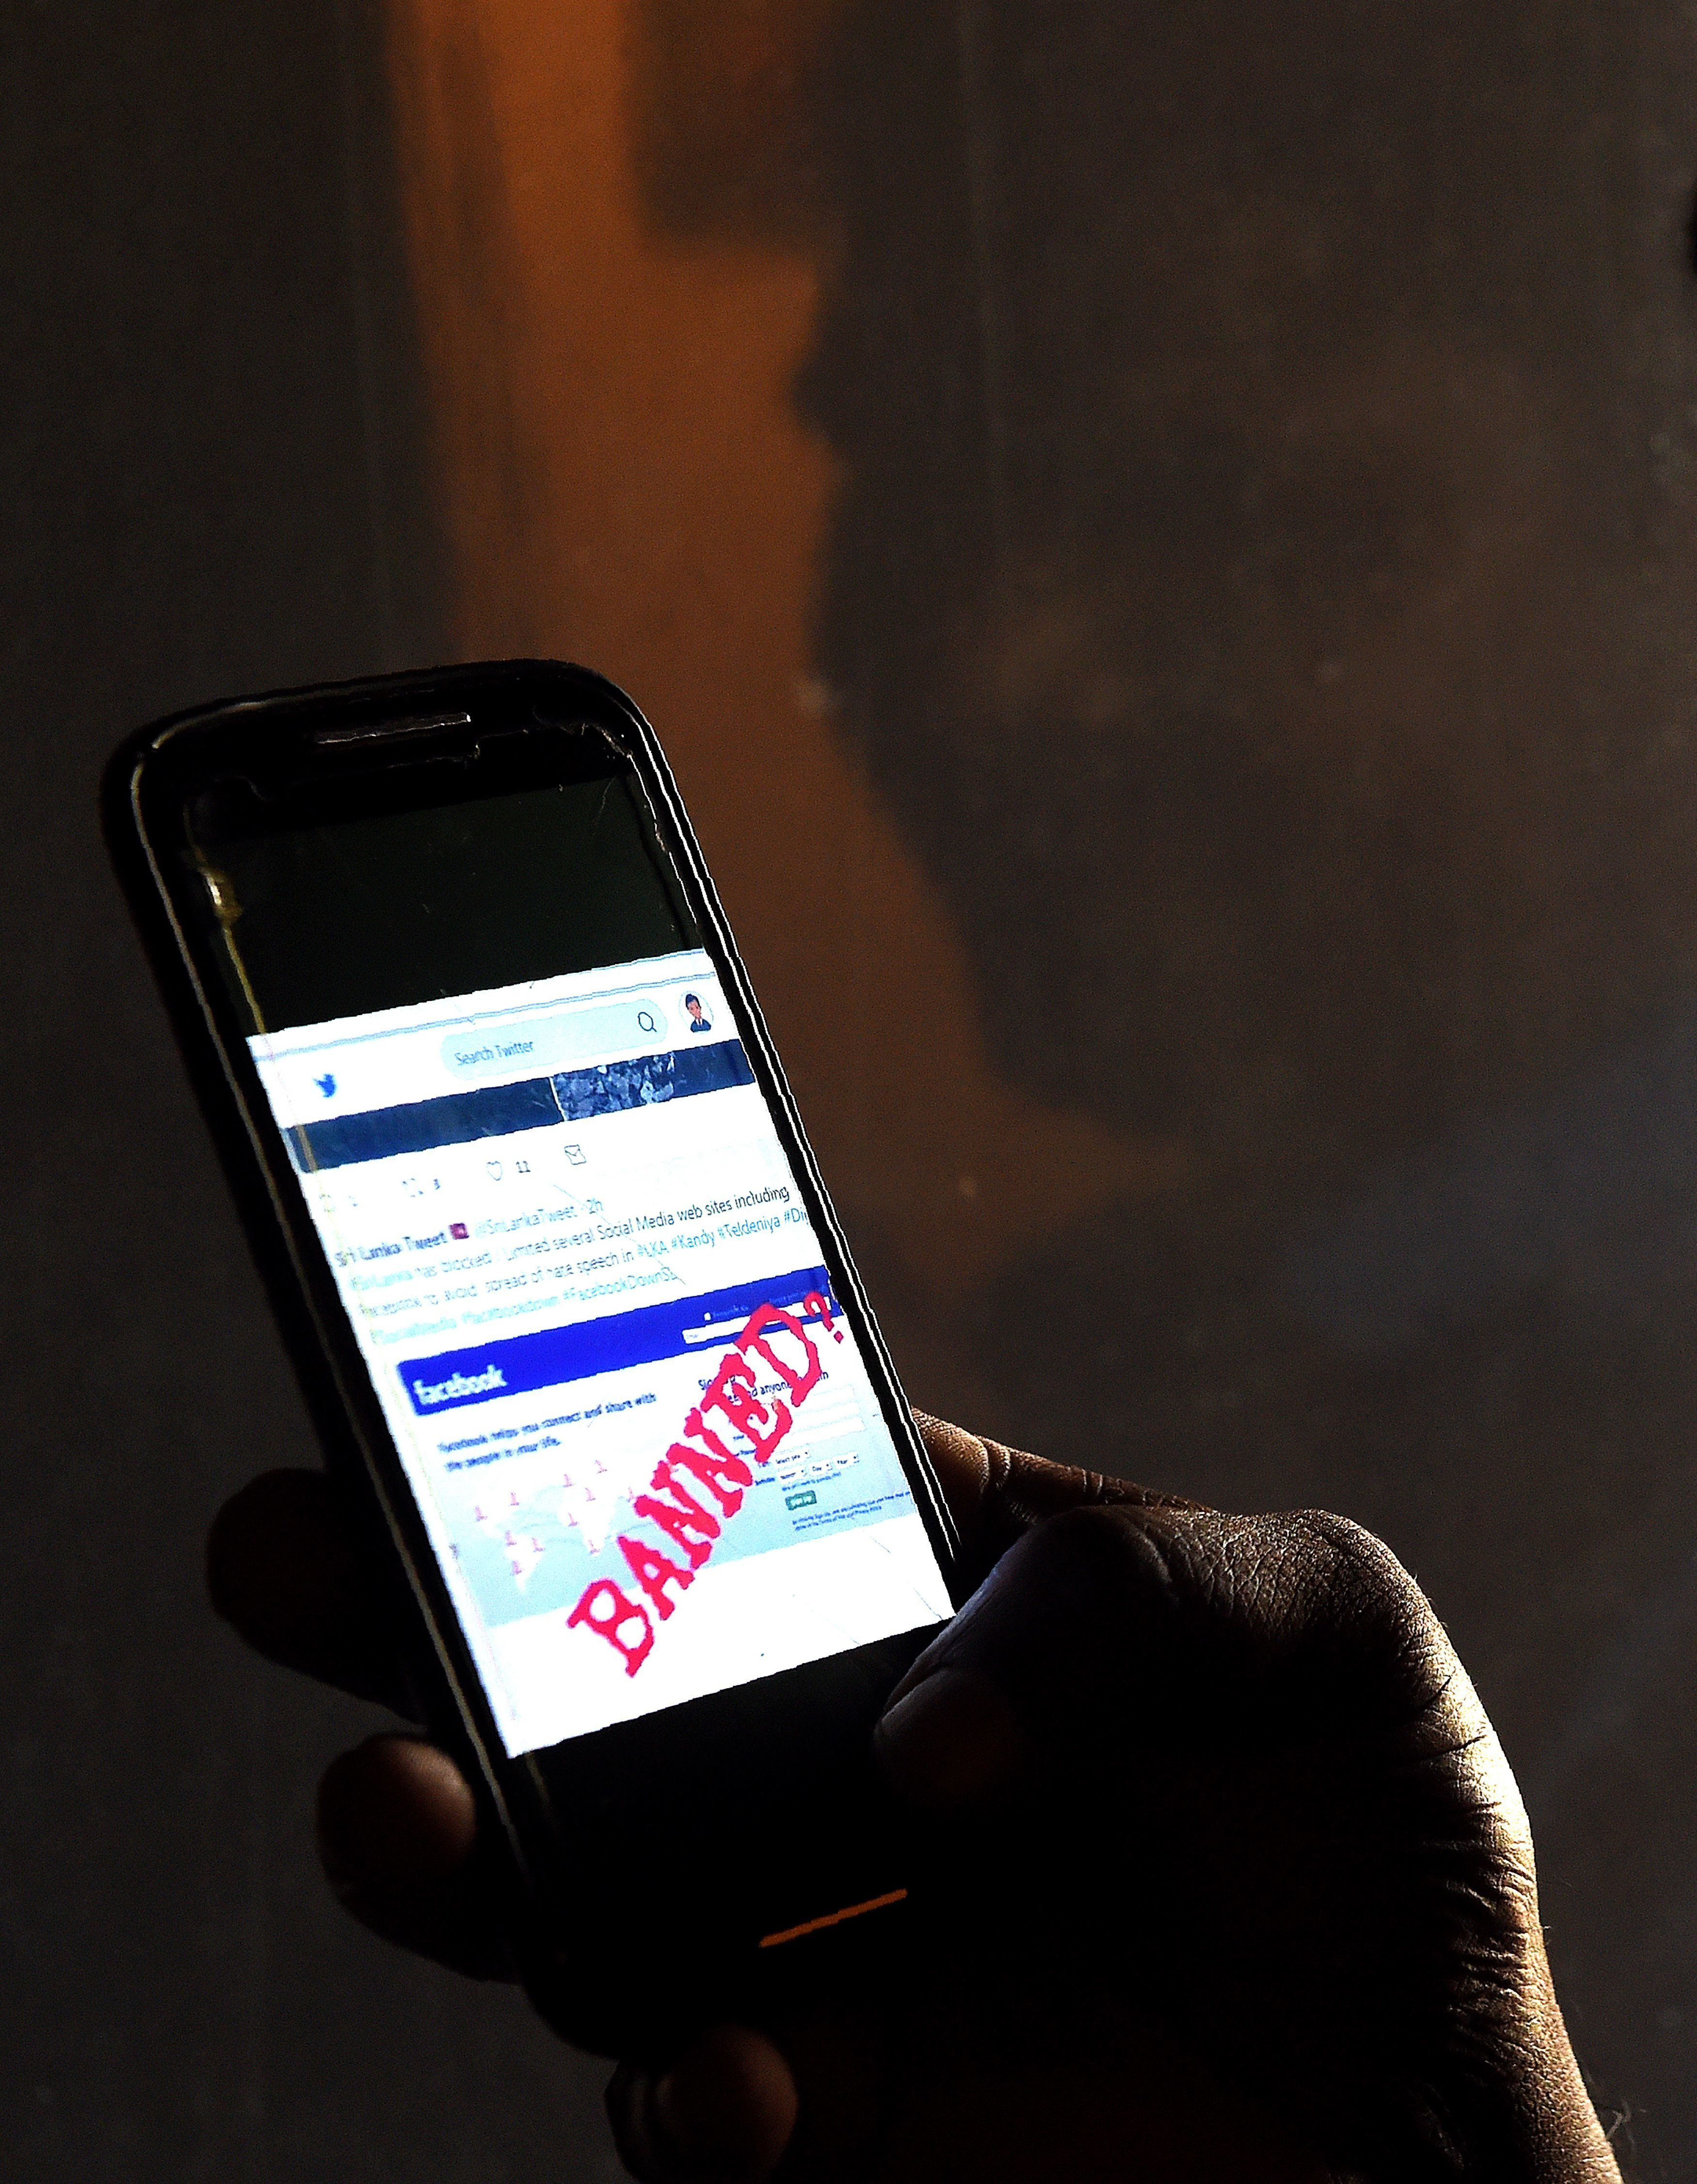 Sri Lanka's Social Media Ban Is Making Facebook Look Like A Victim. It